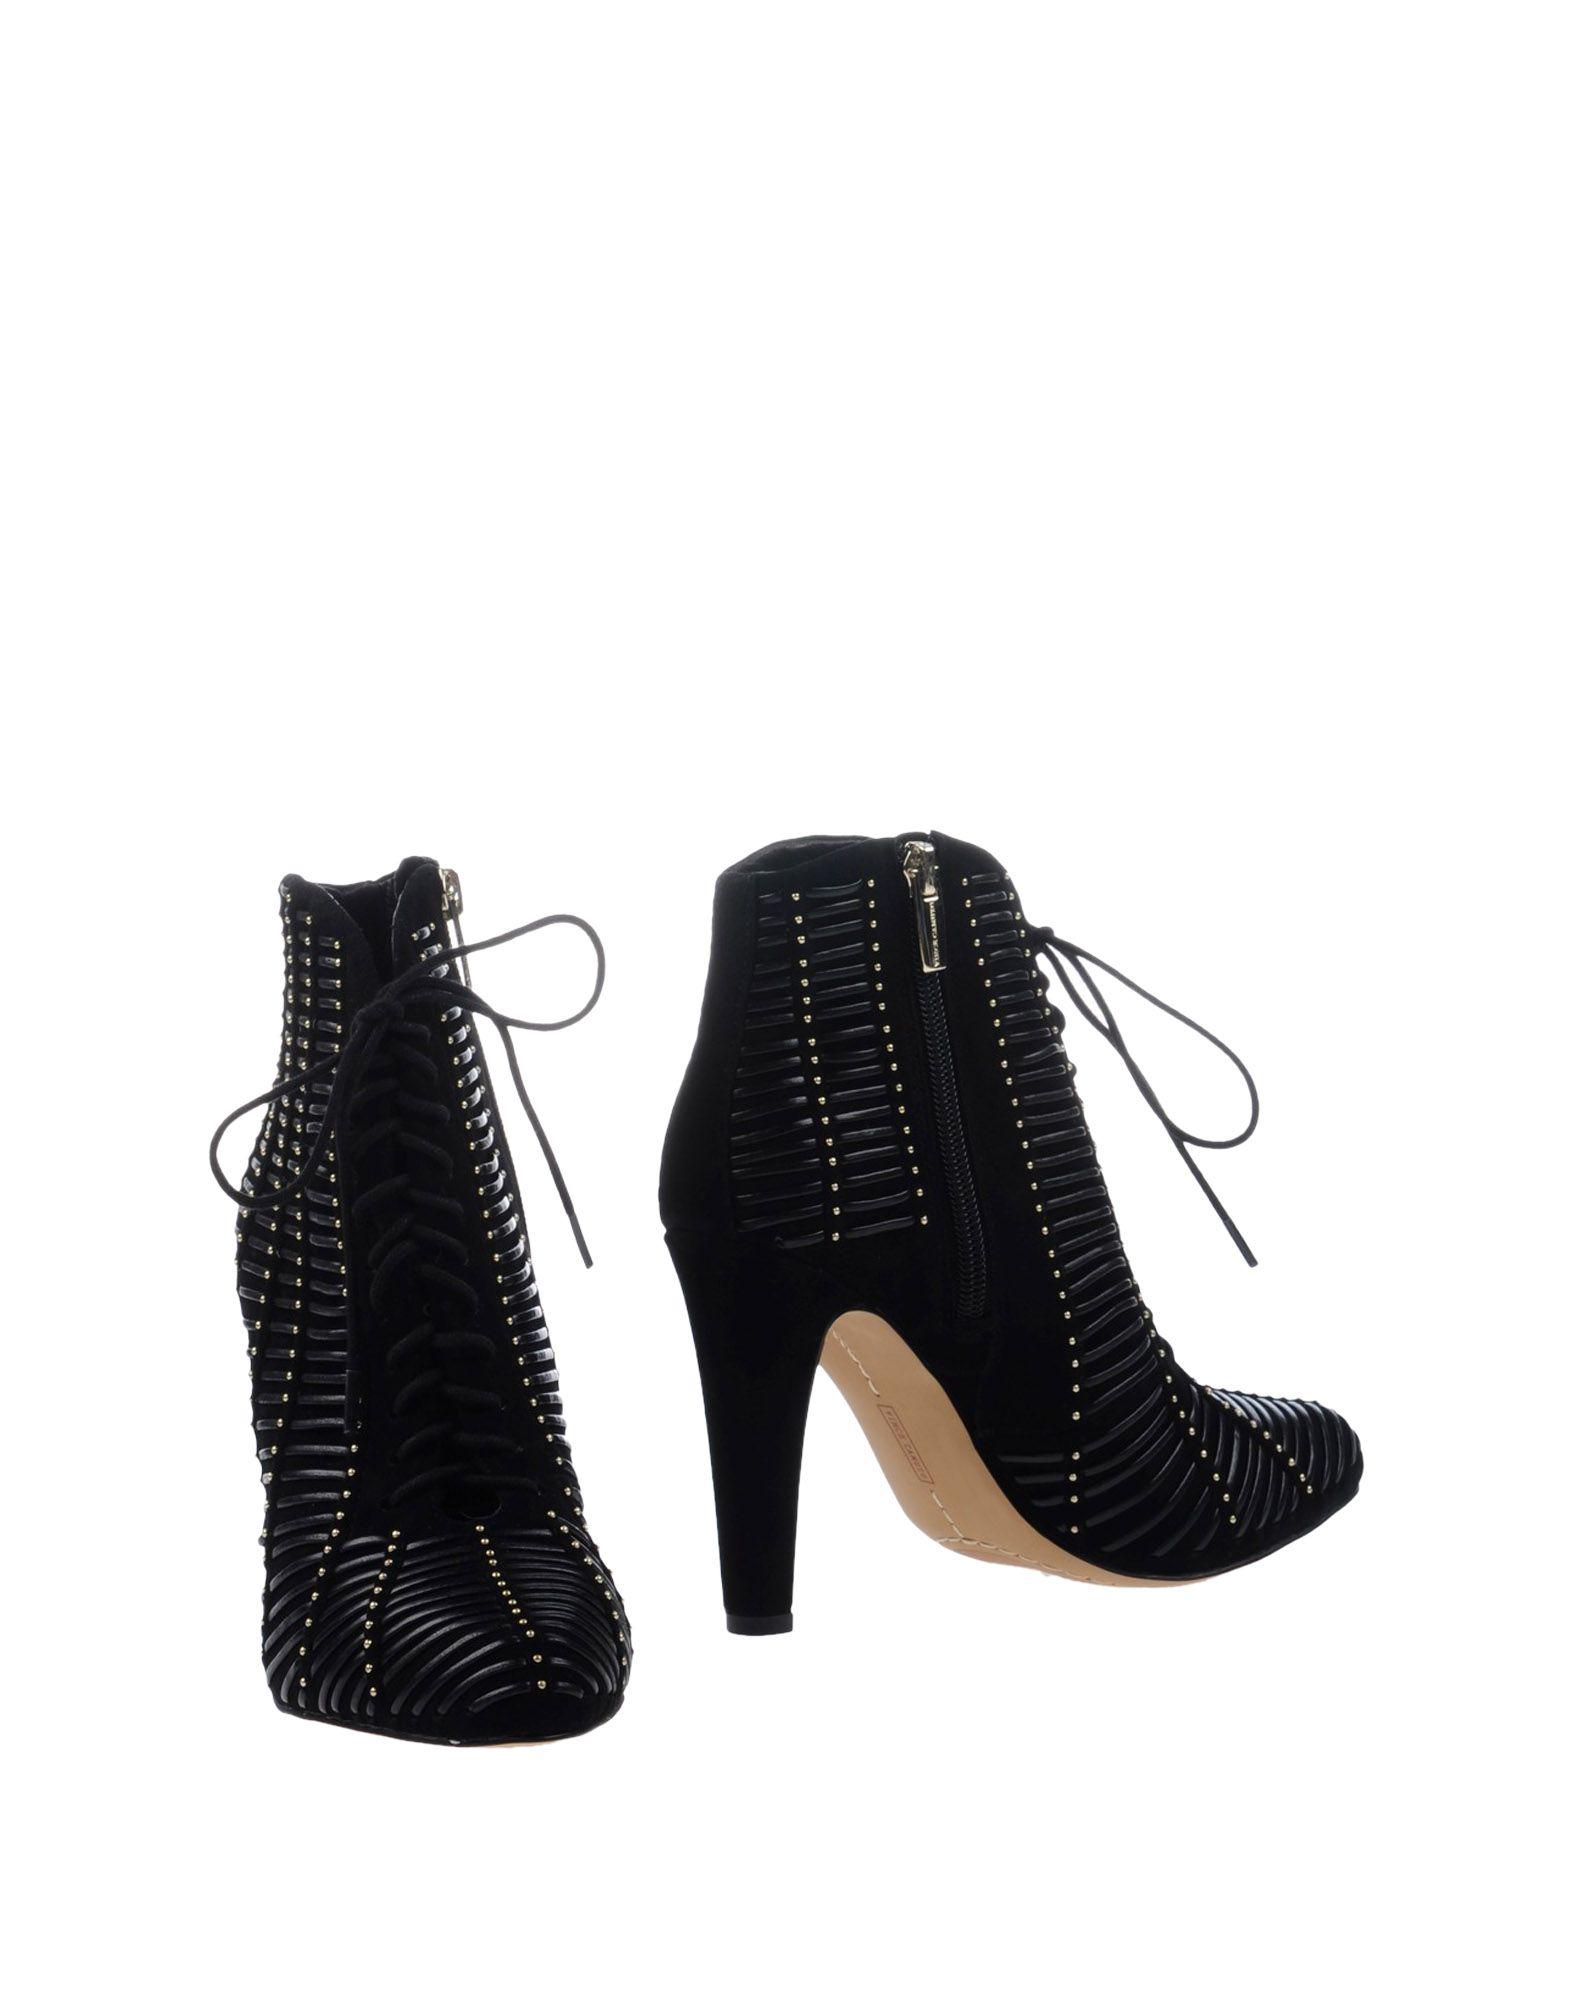 Vince Camuto Stiefelette Damen  11252936WV Neue Schuhe